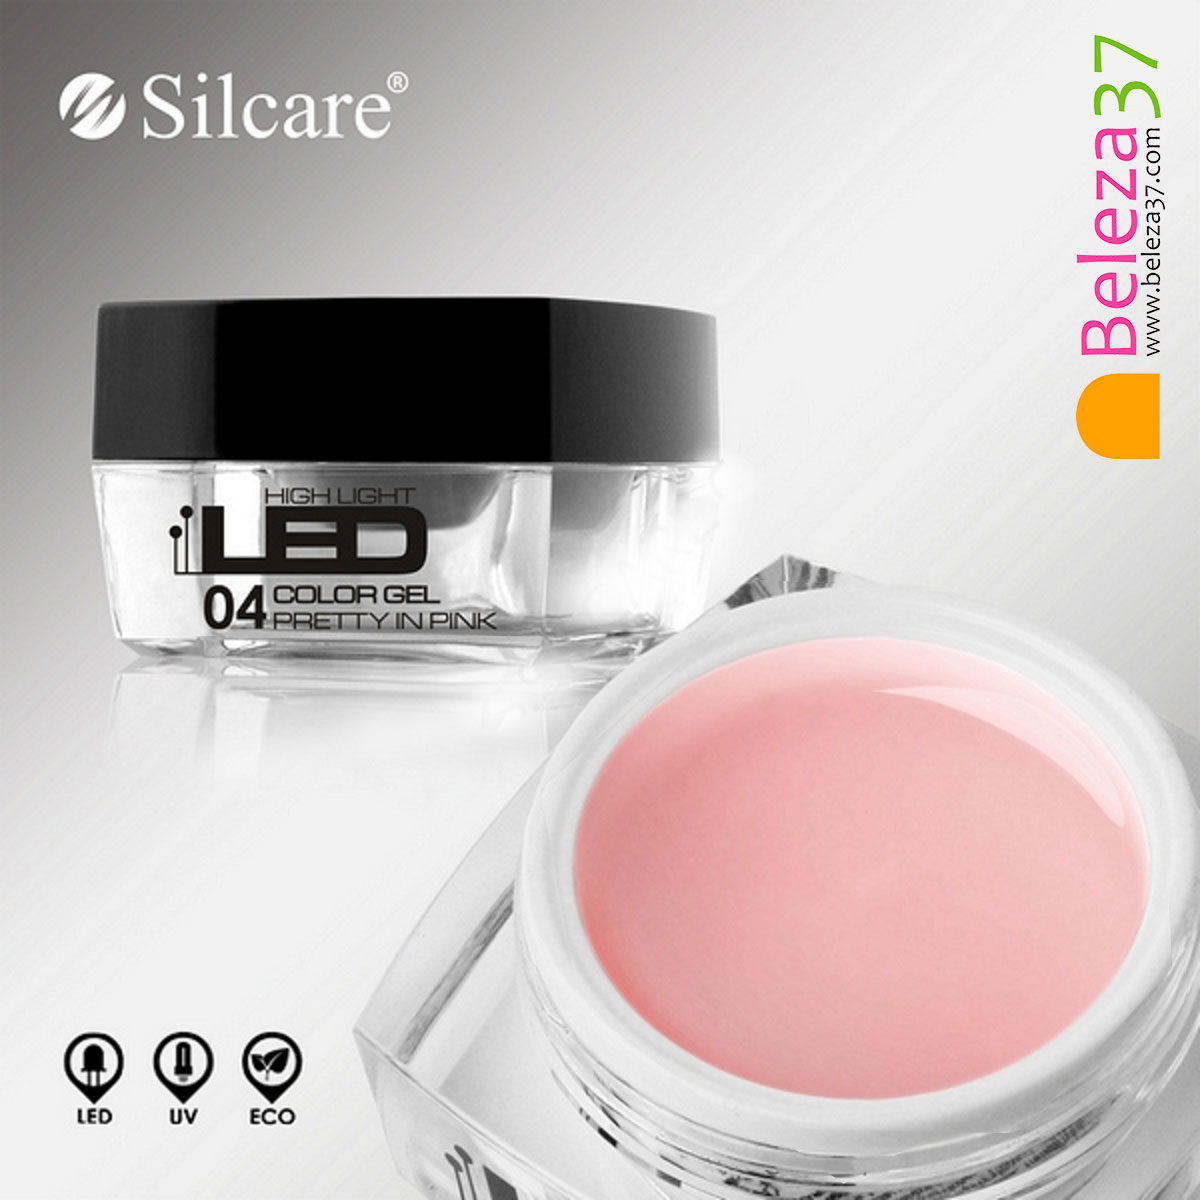 Gel High Light LED #04 – Pretty In Pink